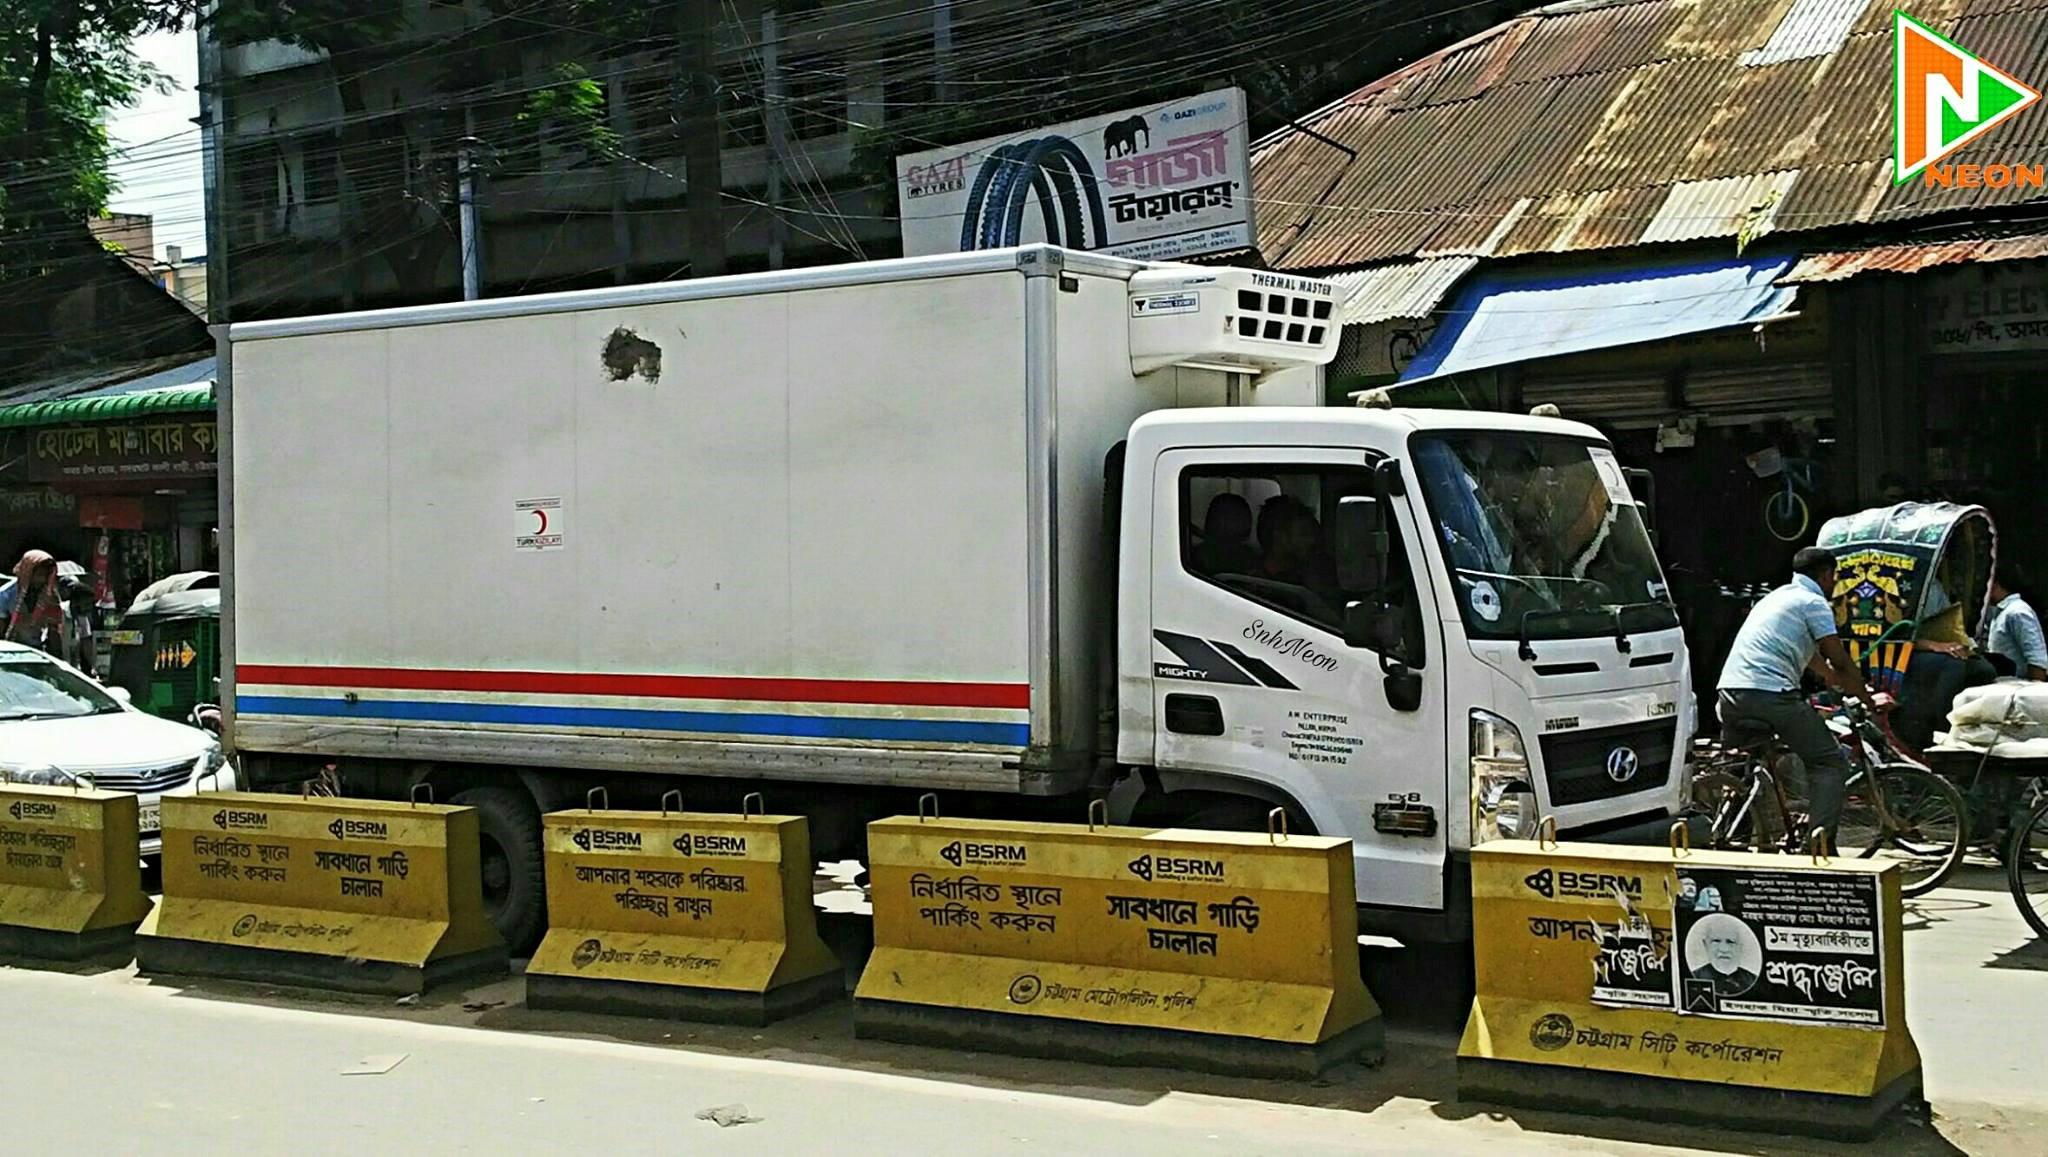 Hyundai-Mighty-Amar-road-Chittagong---